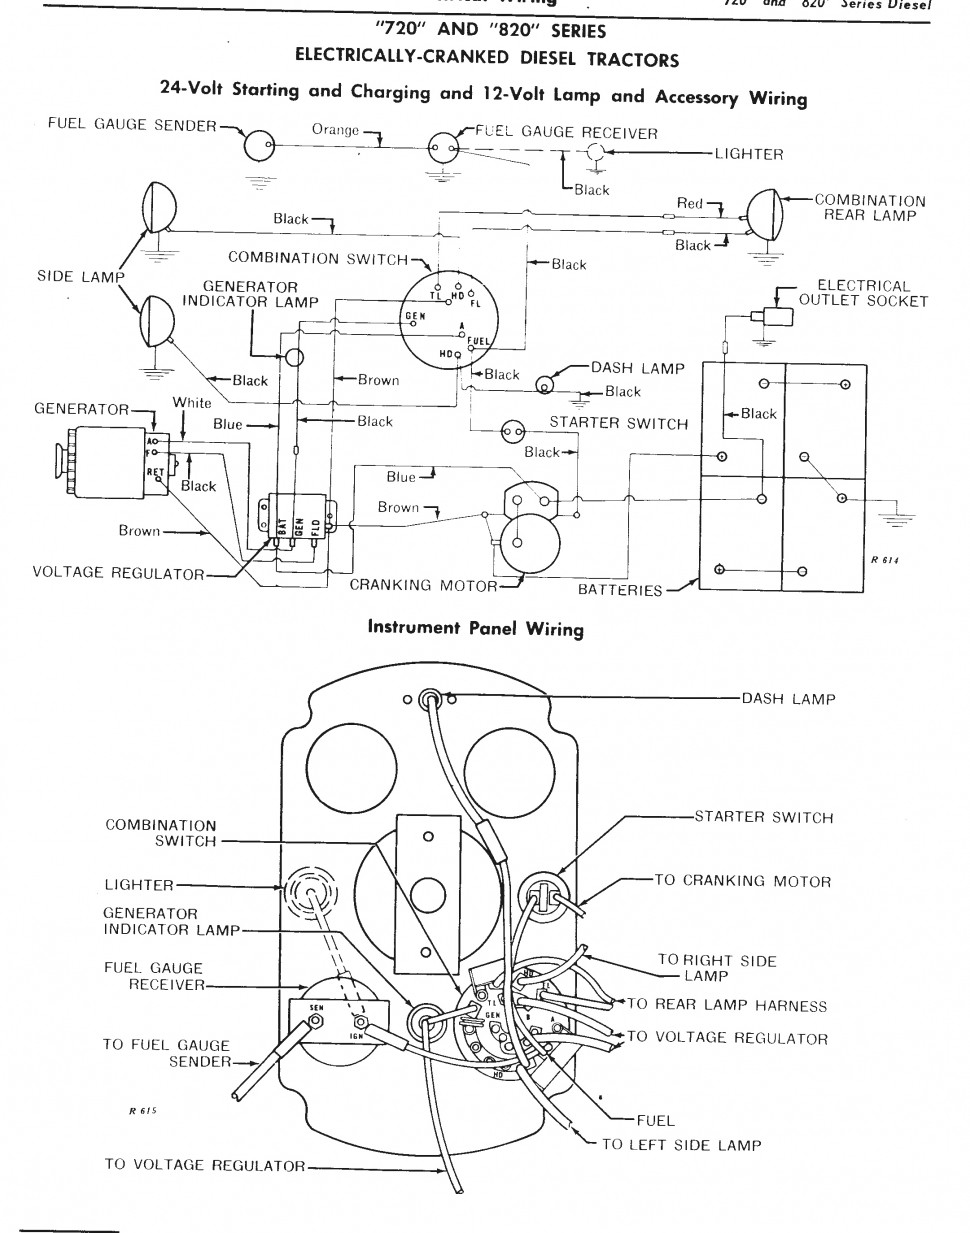 medium resolution of john deere 3020 fuel gage wiring diagram basic guide